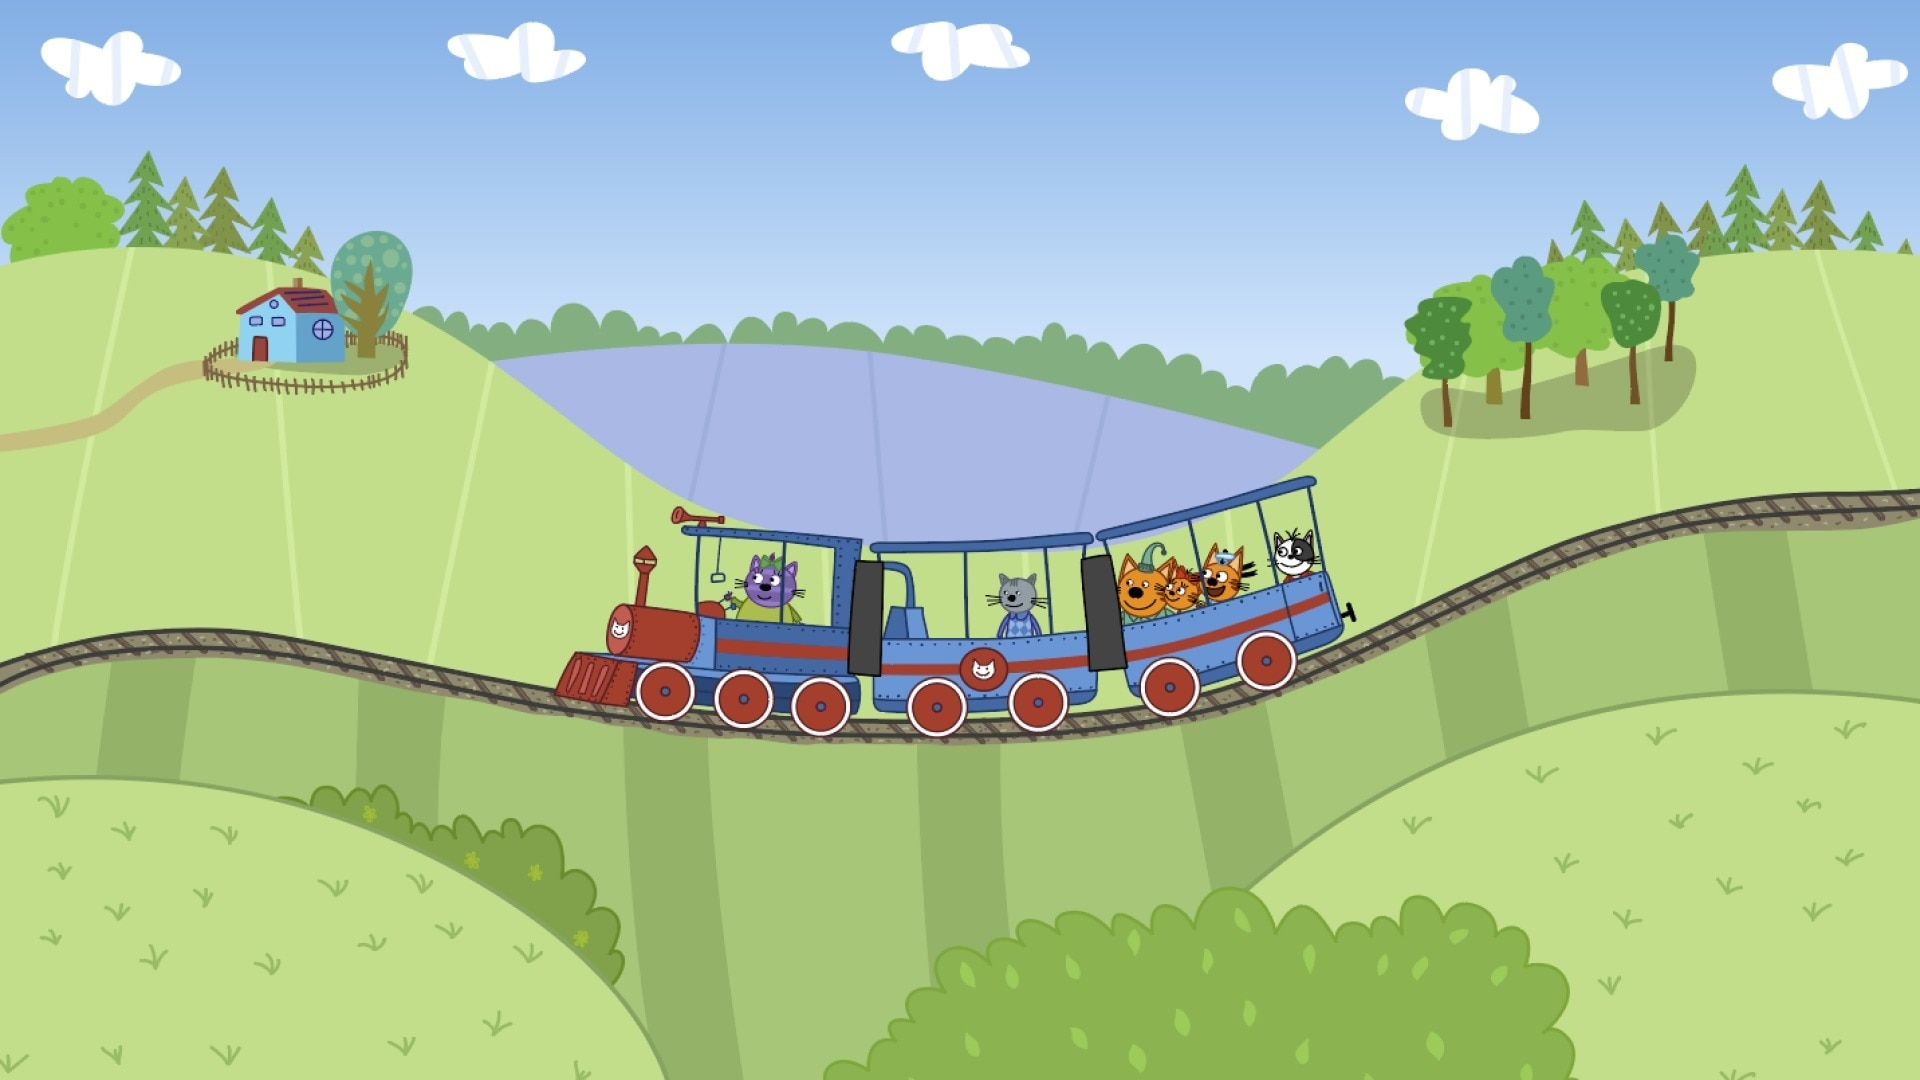 The Kitty Train